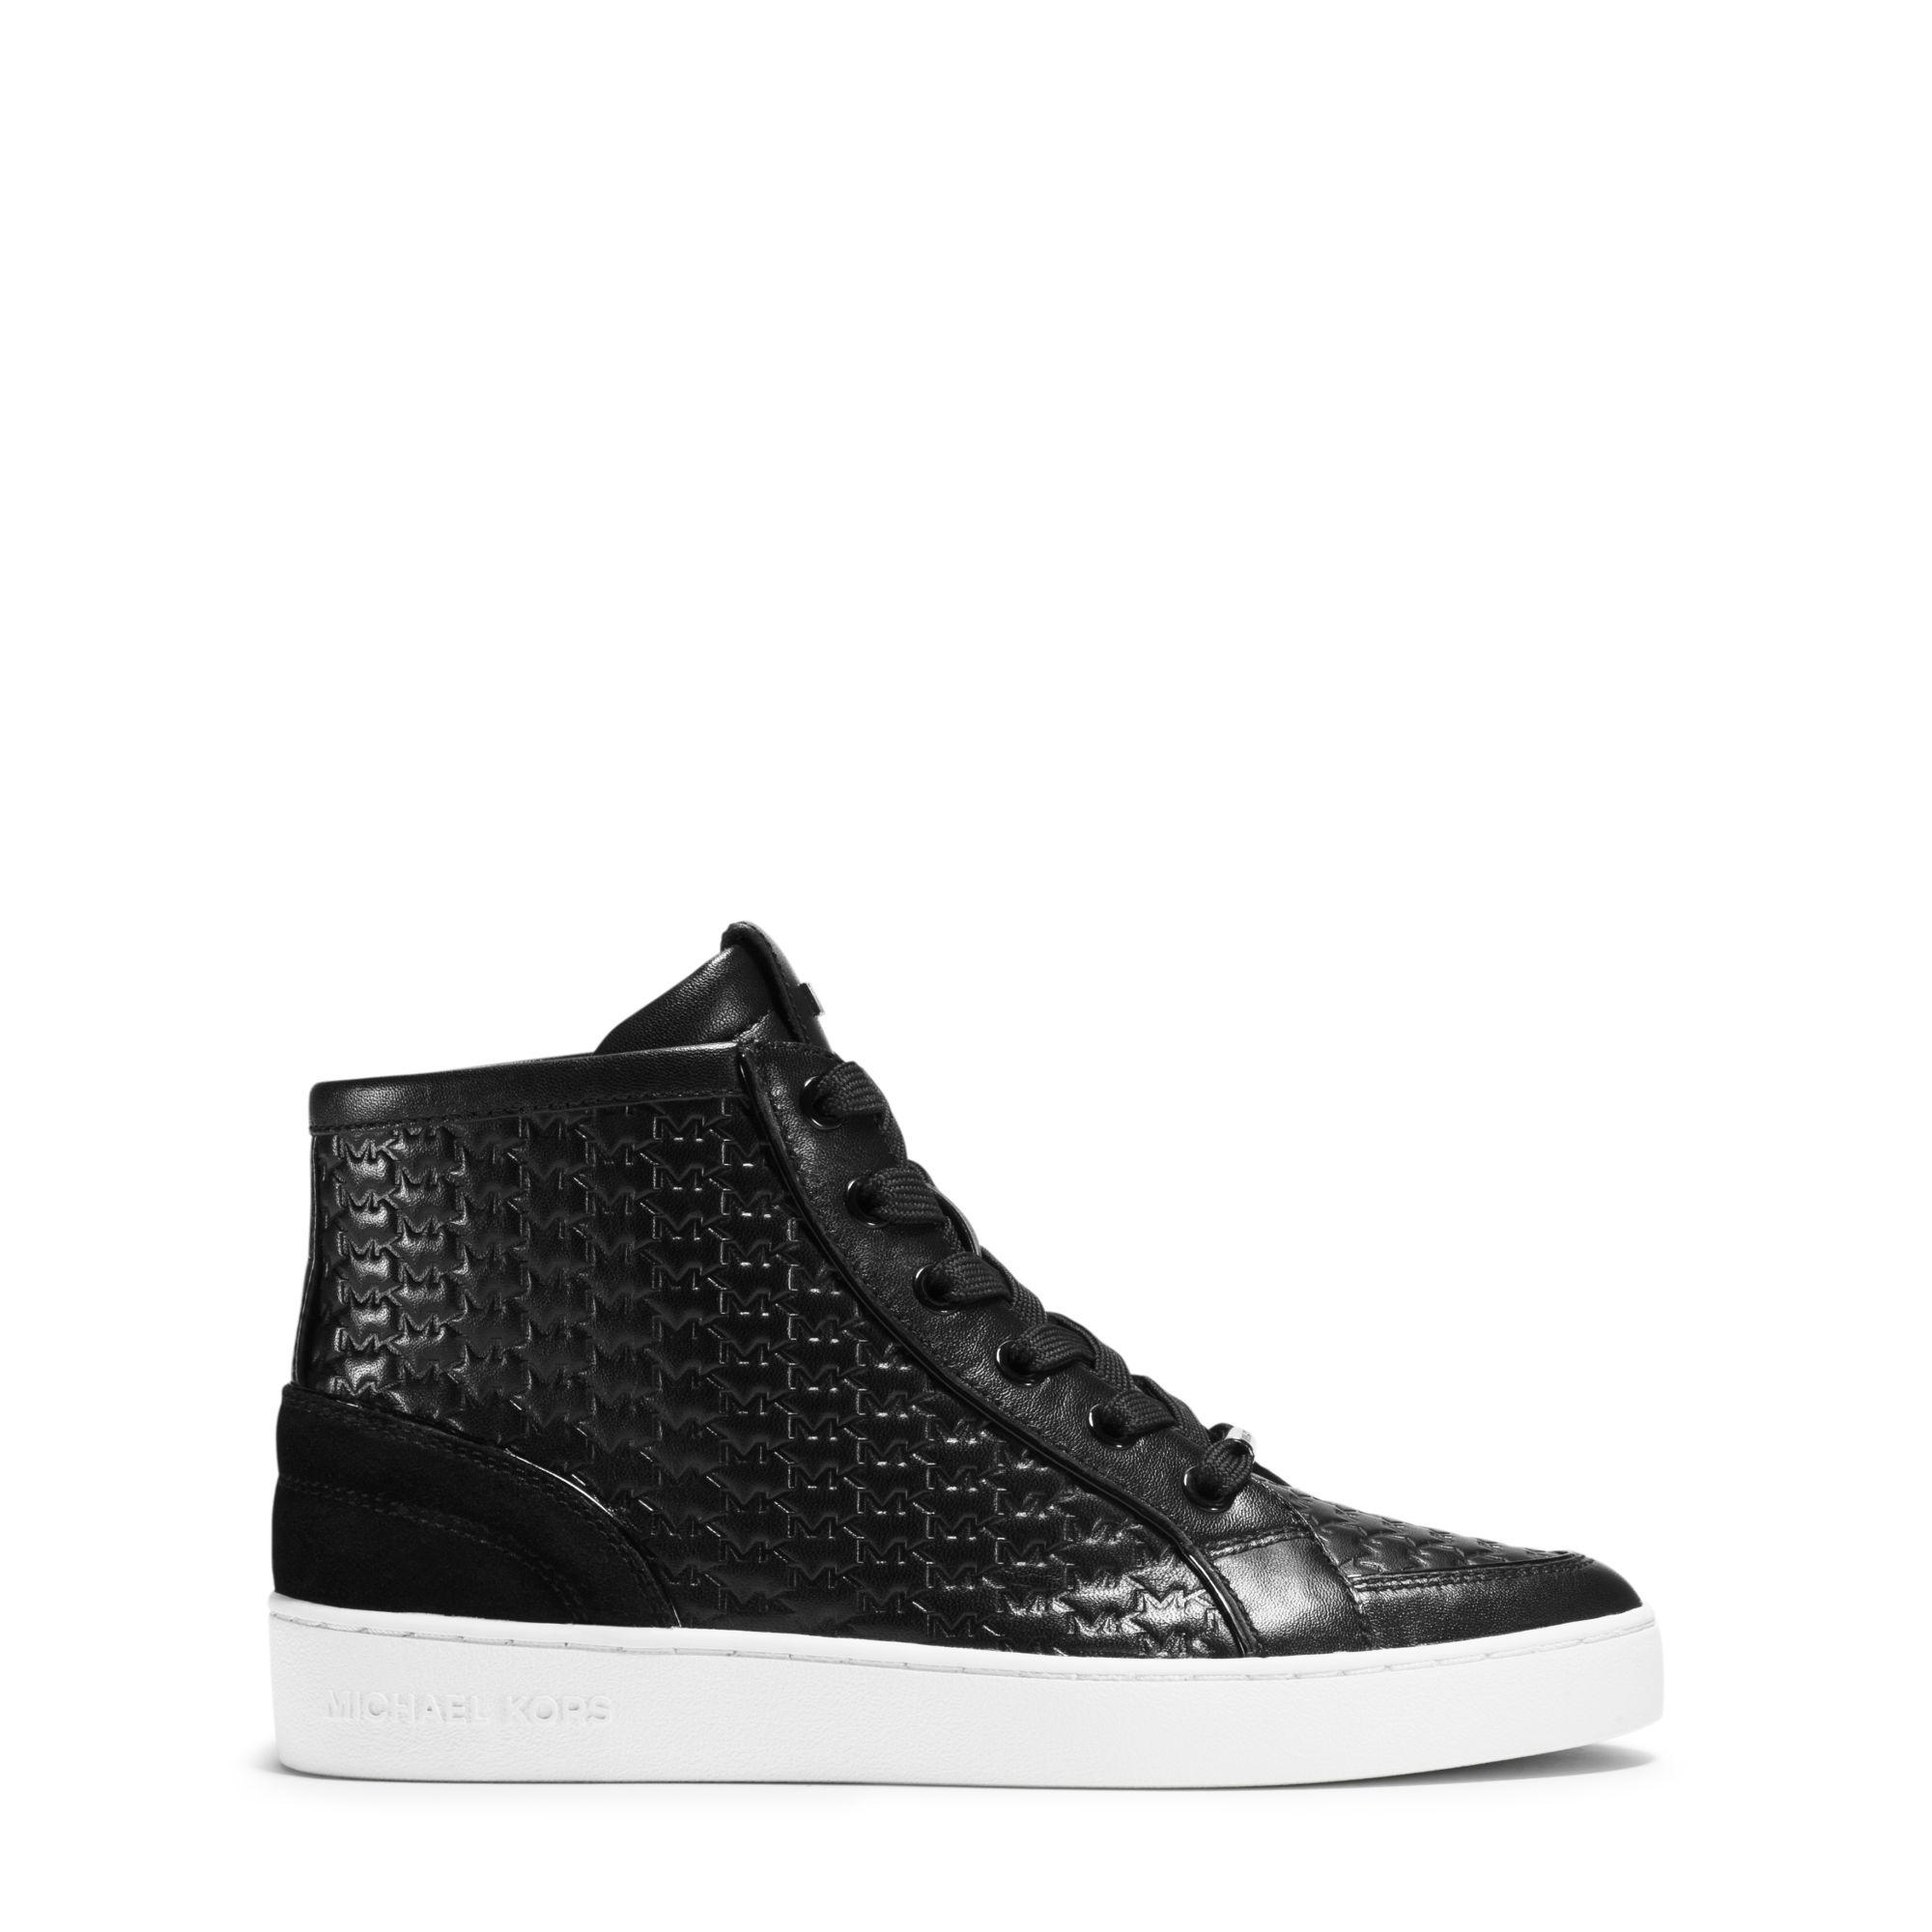 official michael kors outlet omhx  michael kors high top sneakers black